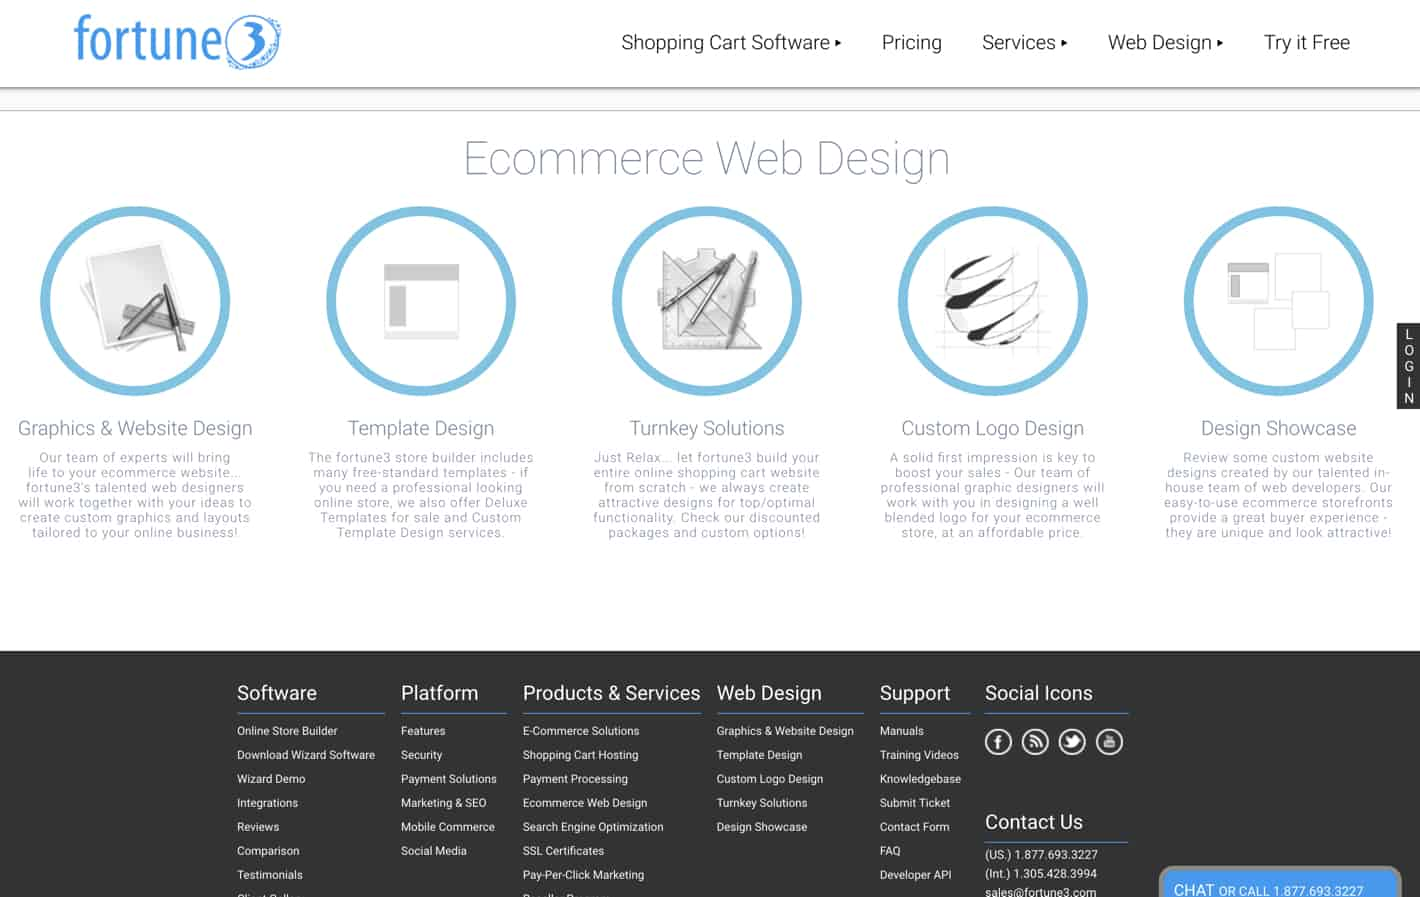 fortune3 e commerce review